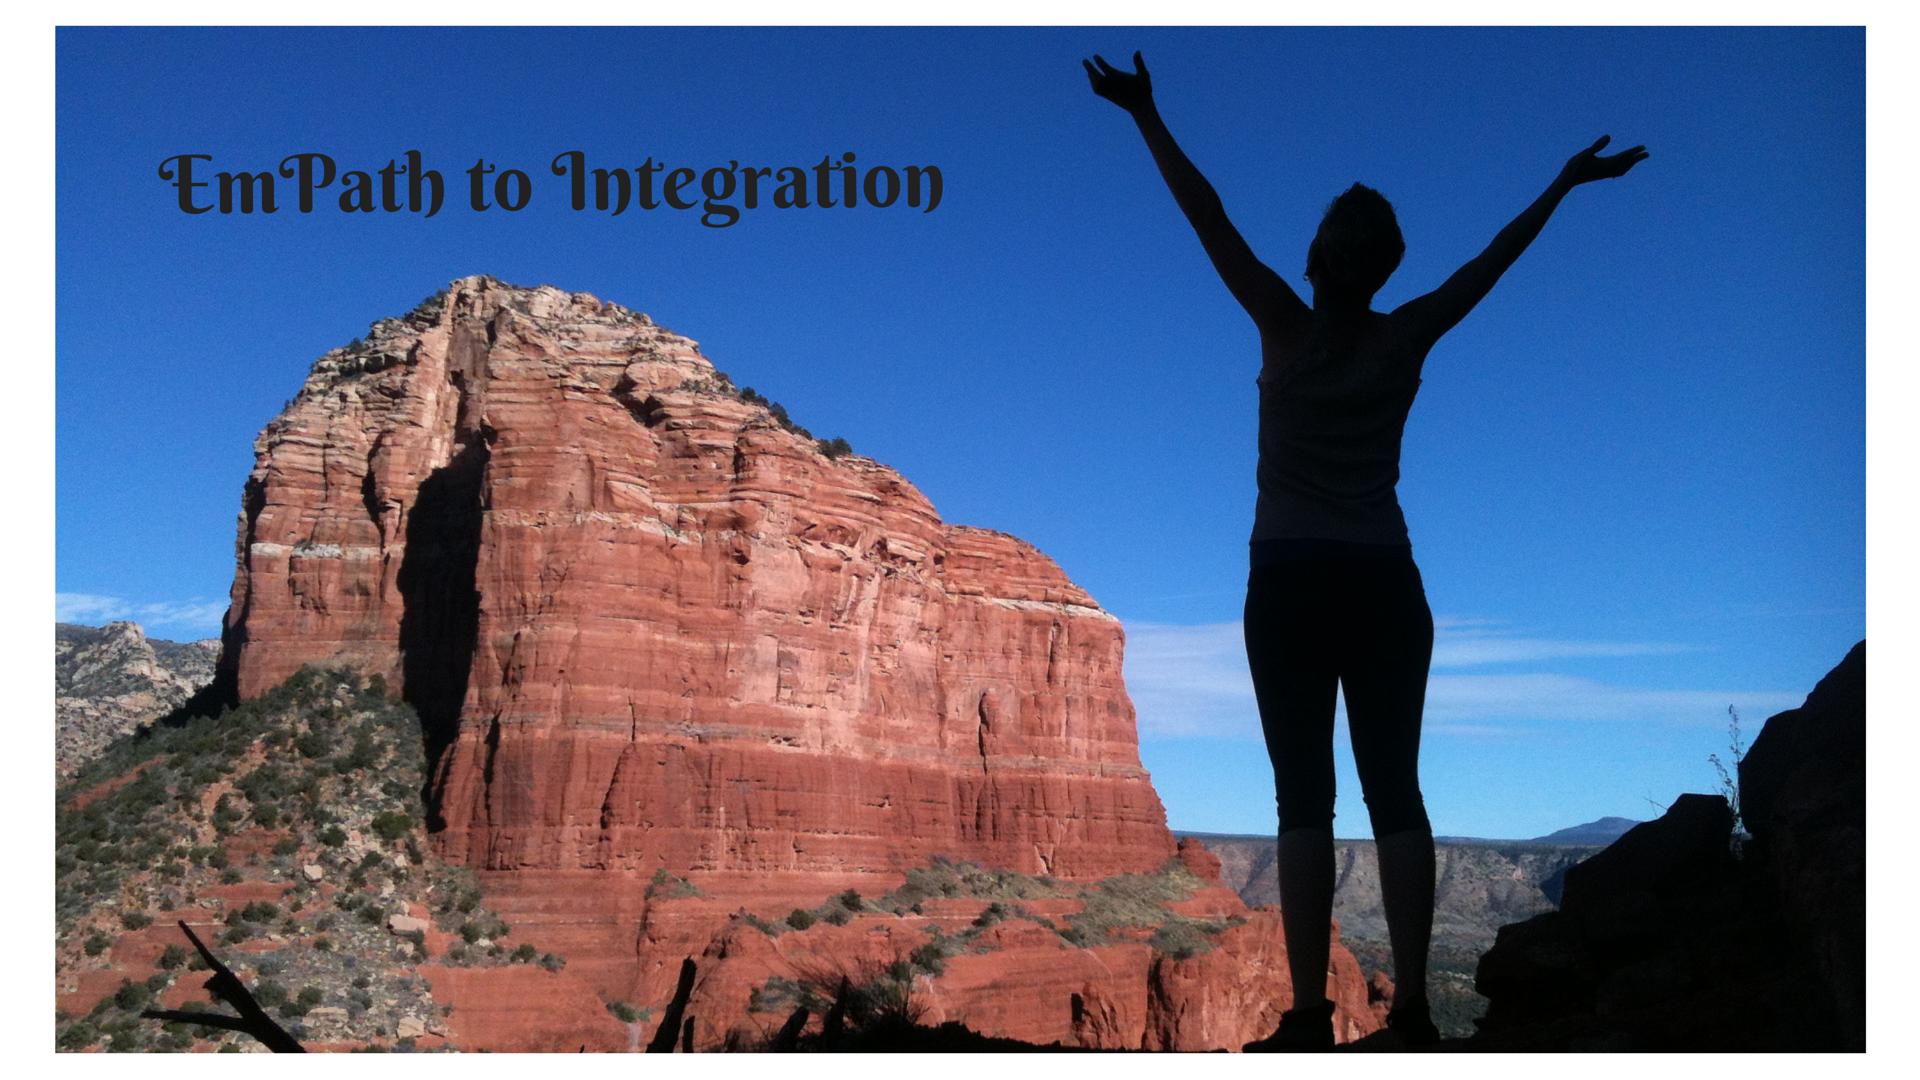 EmPath to Integration